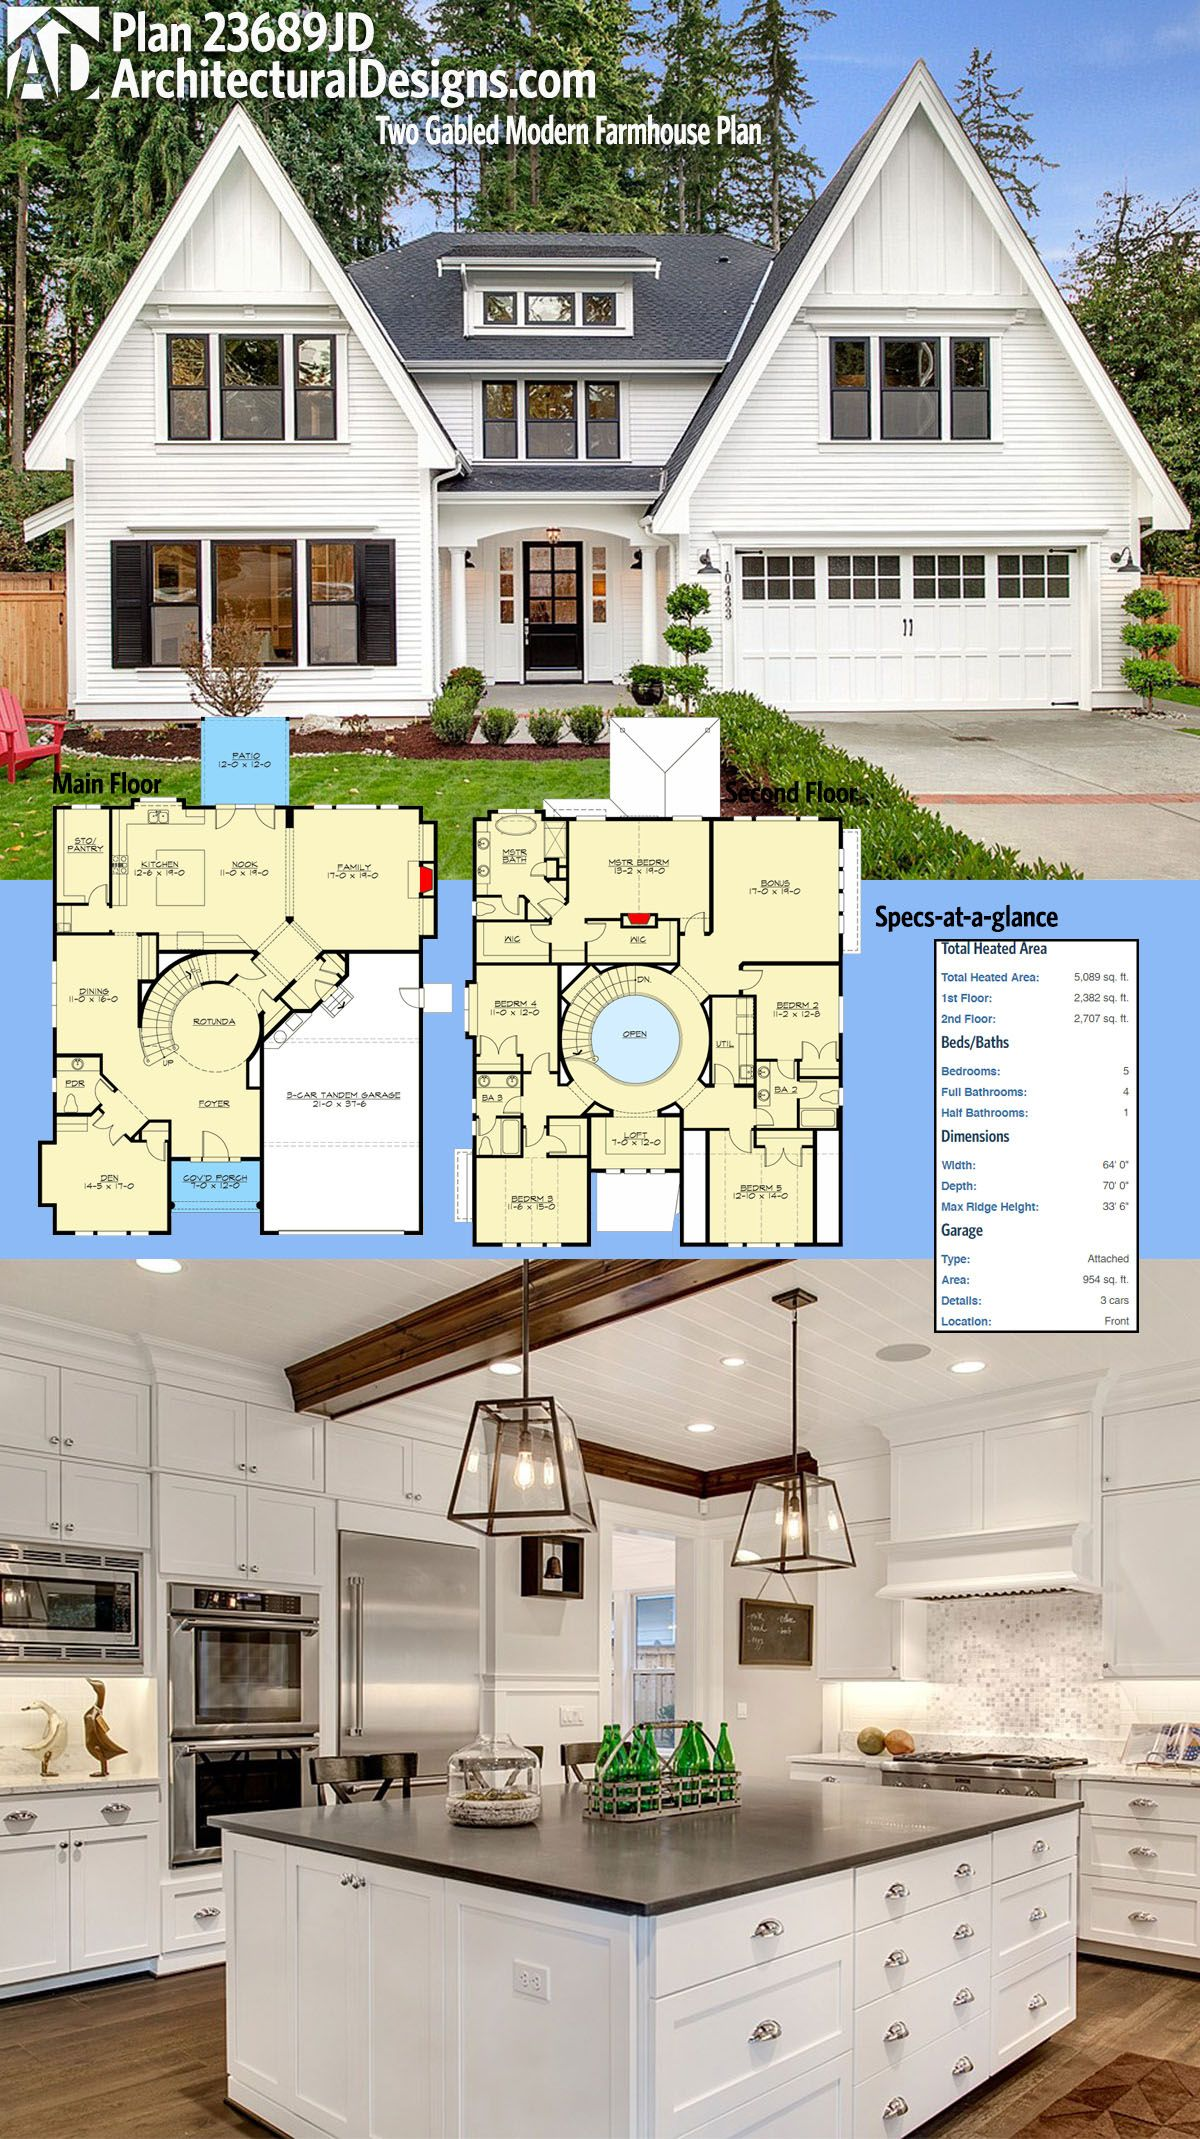 Best Kitchen Gallery: Plan 23689jd Two Gabled Modern Farmhouse Plan Architectural of Circular Room Home Plan on rachelxblog.com